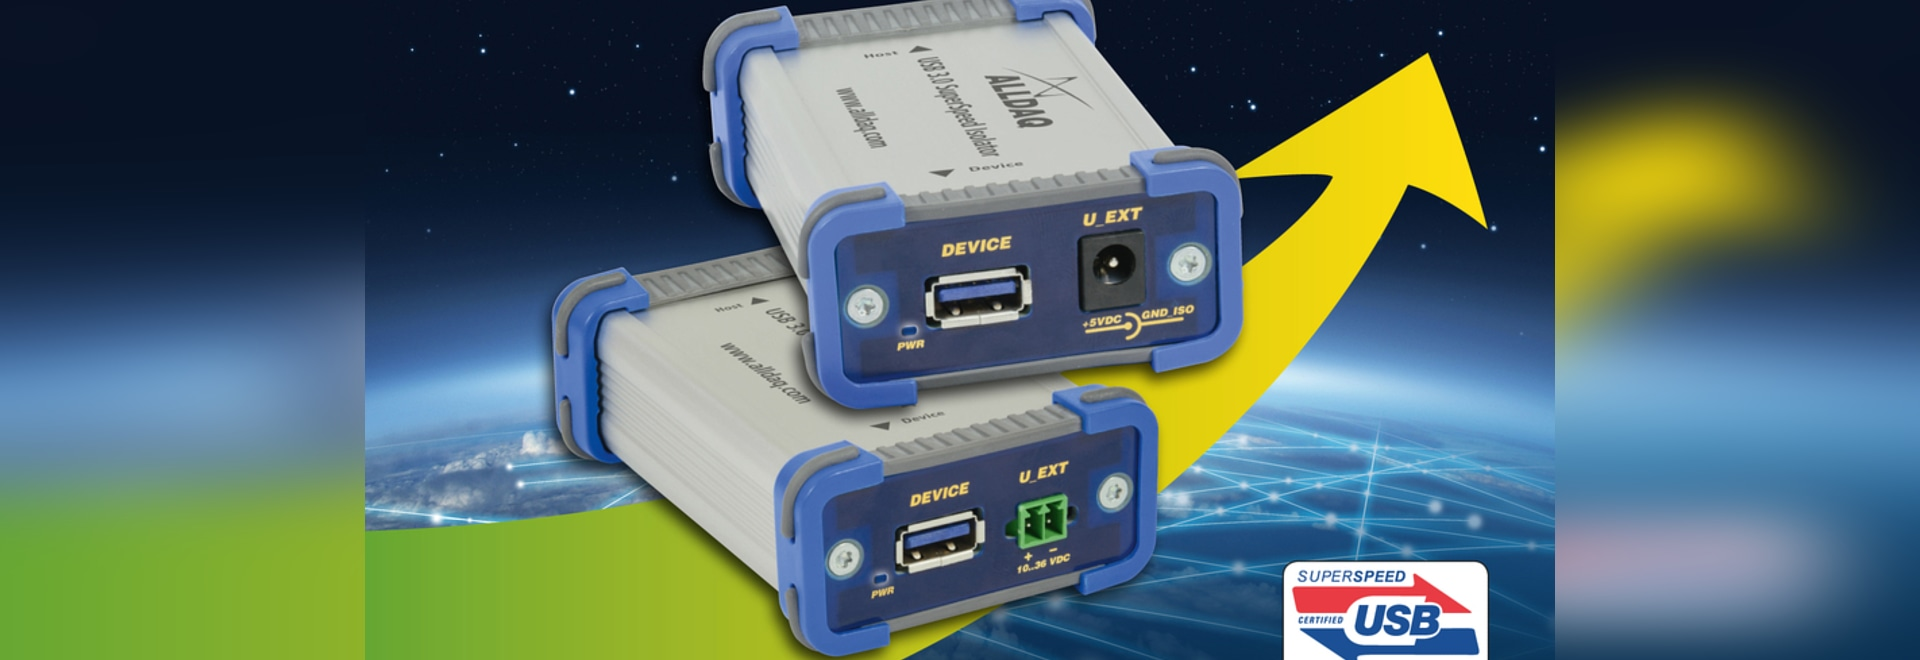 Isolator Keeps USB Ports Clean